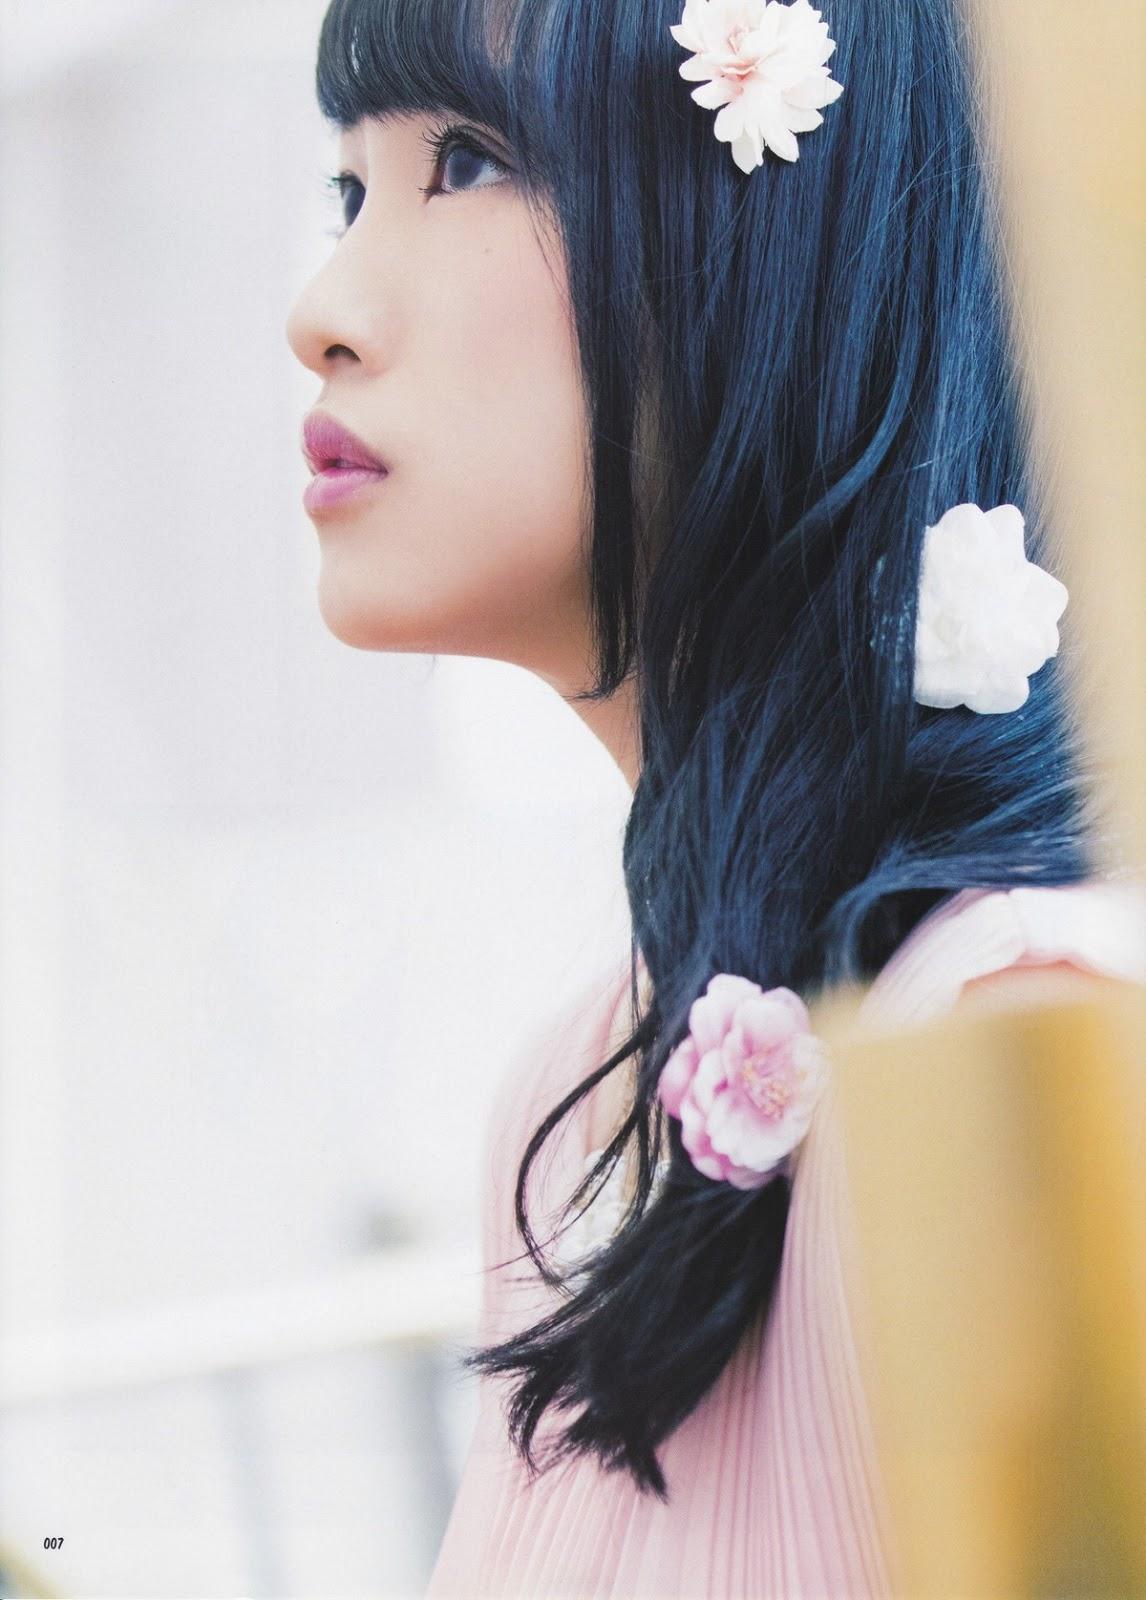 Mukaichi Mion 向井地美音 AKB48, CD&DL My Girl Vol.11 2016 Gravure